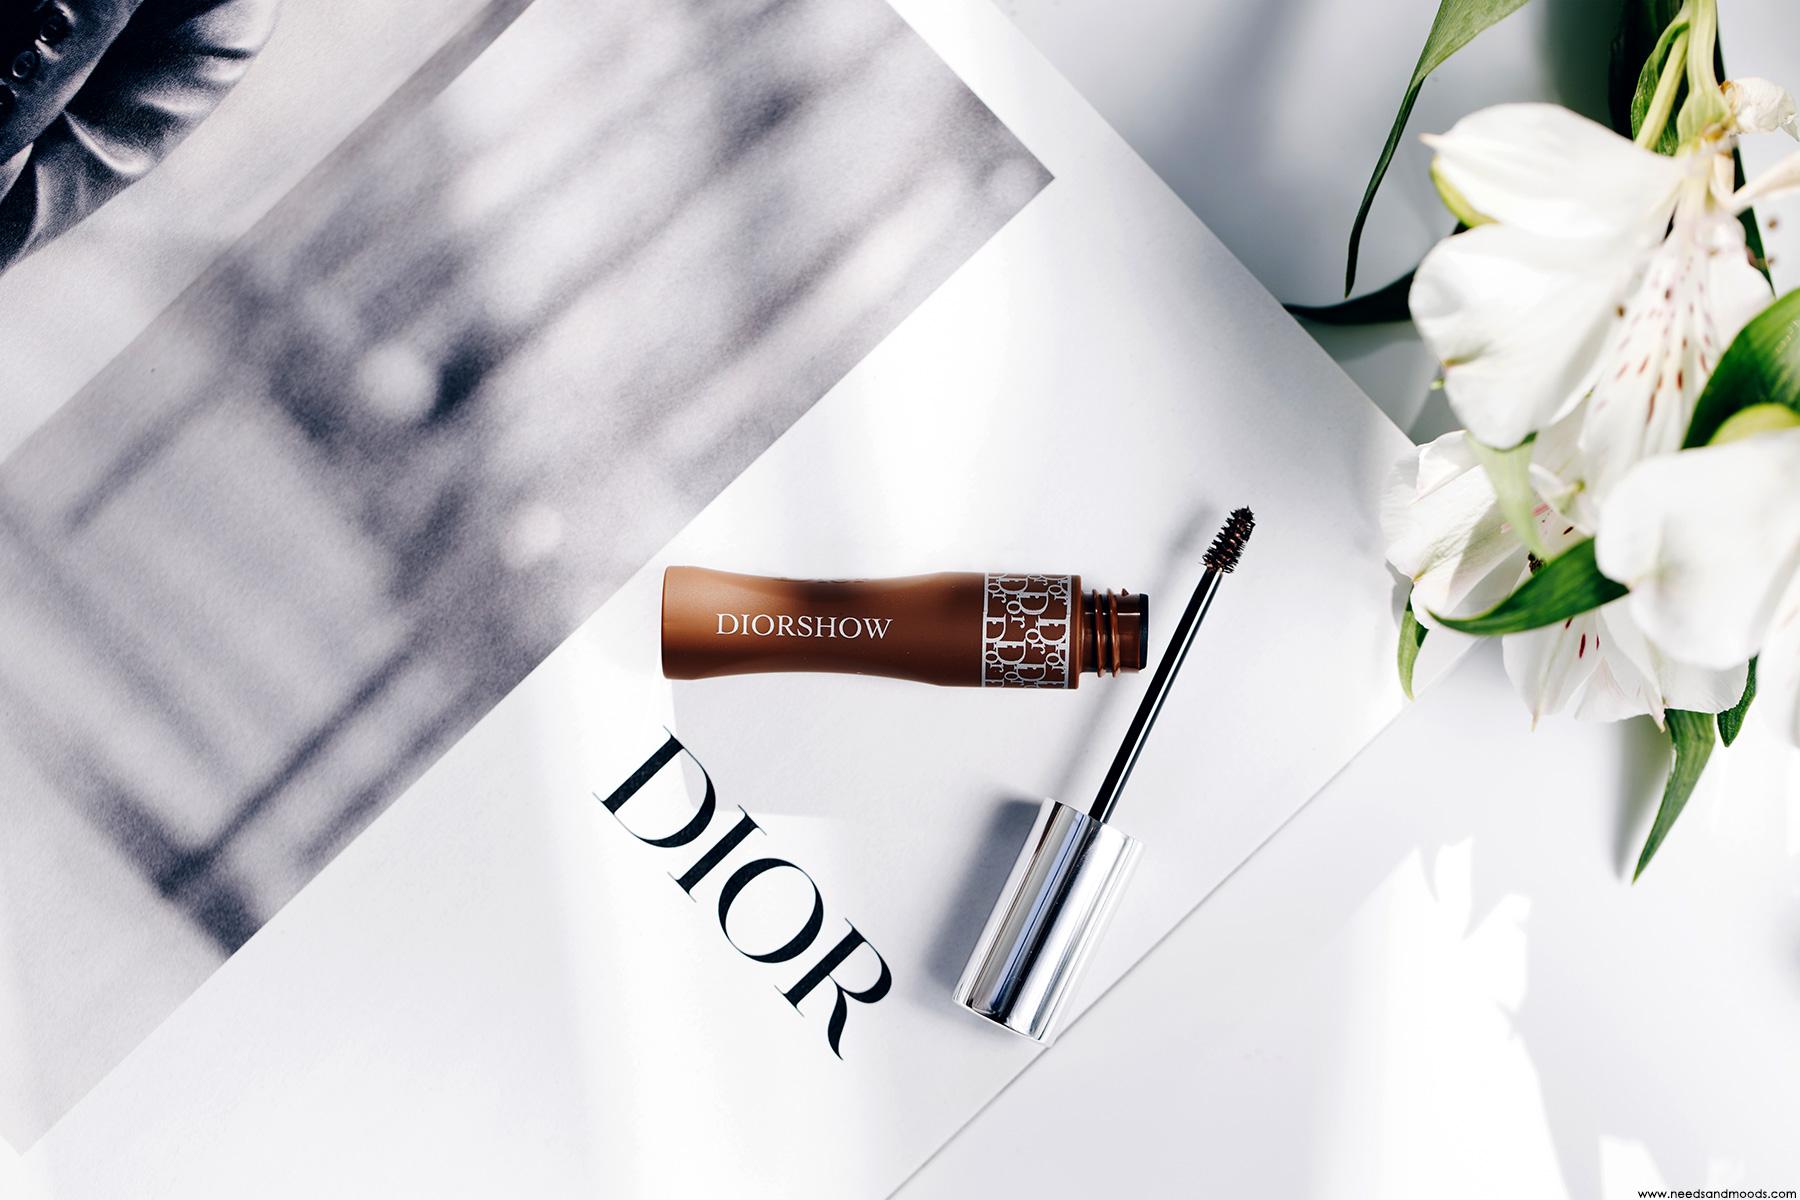 Dior Diorshow pump n brow avis